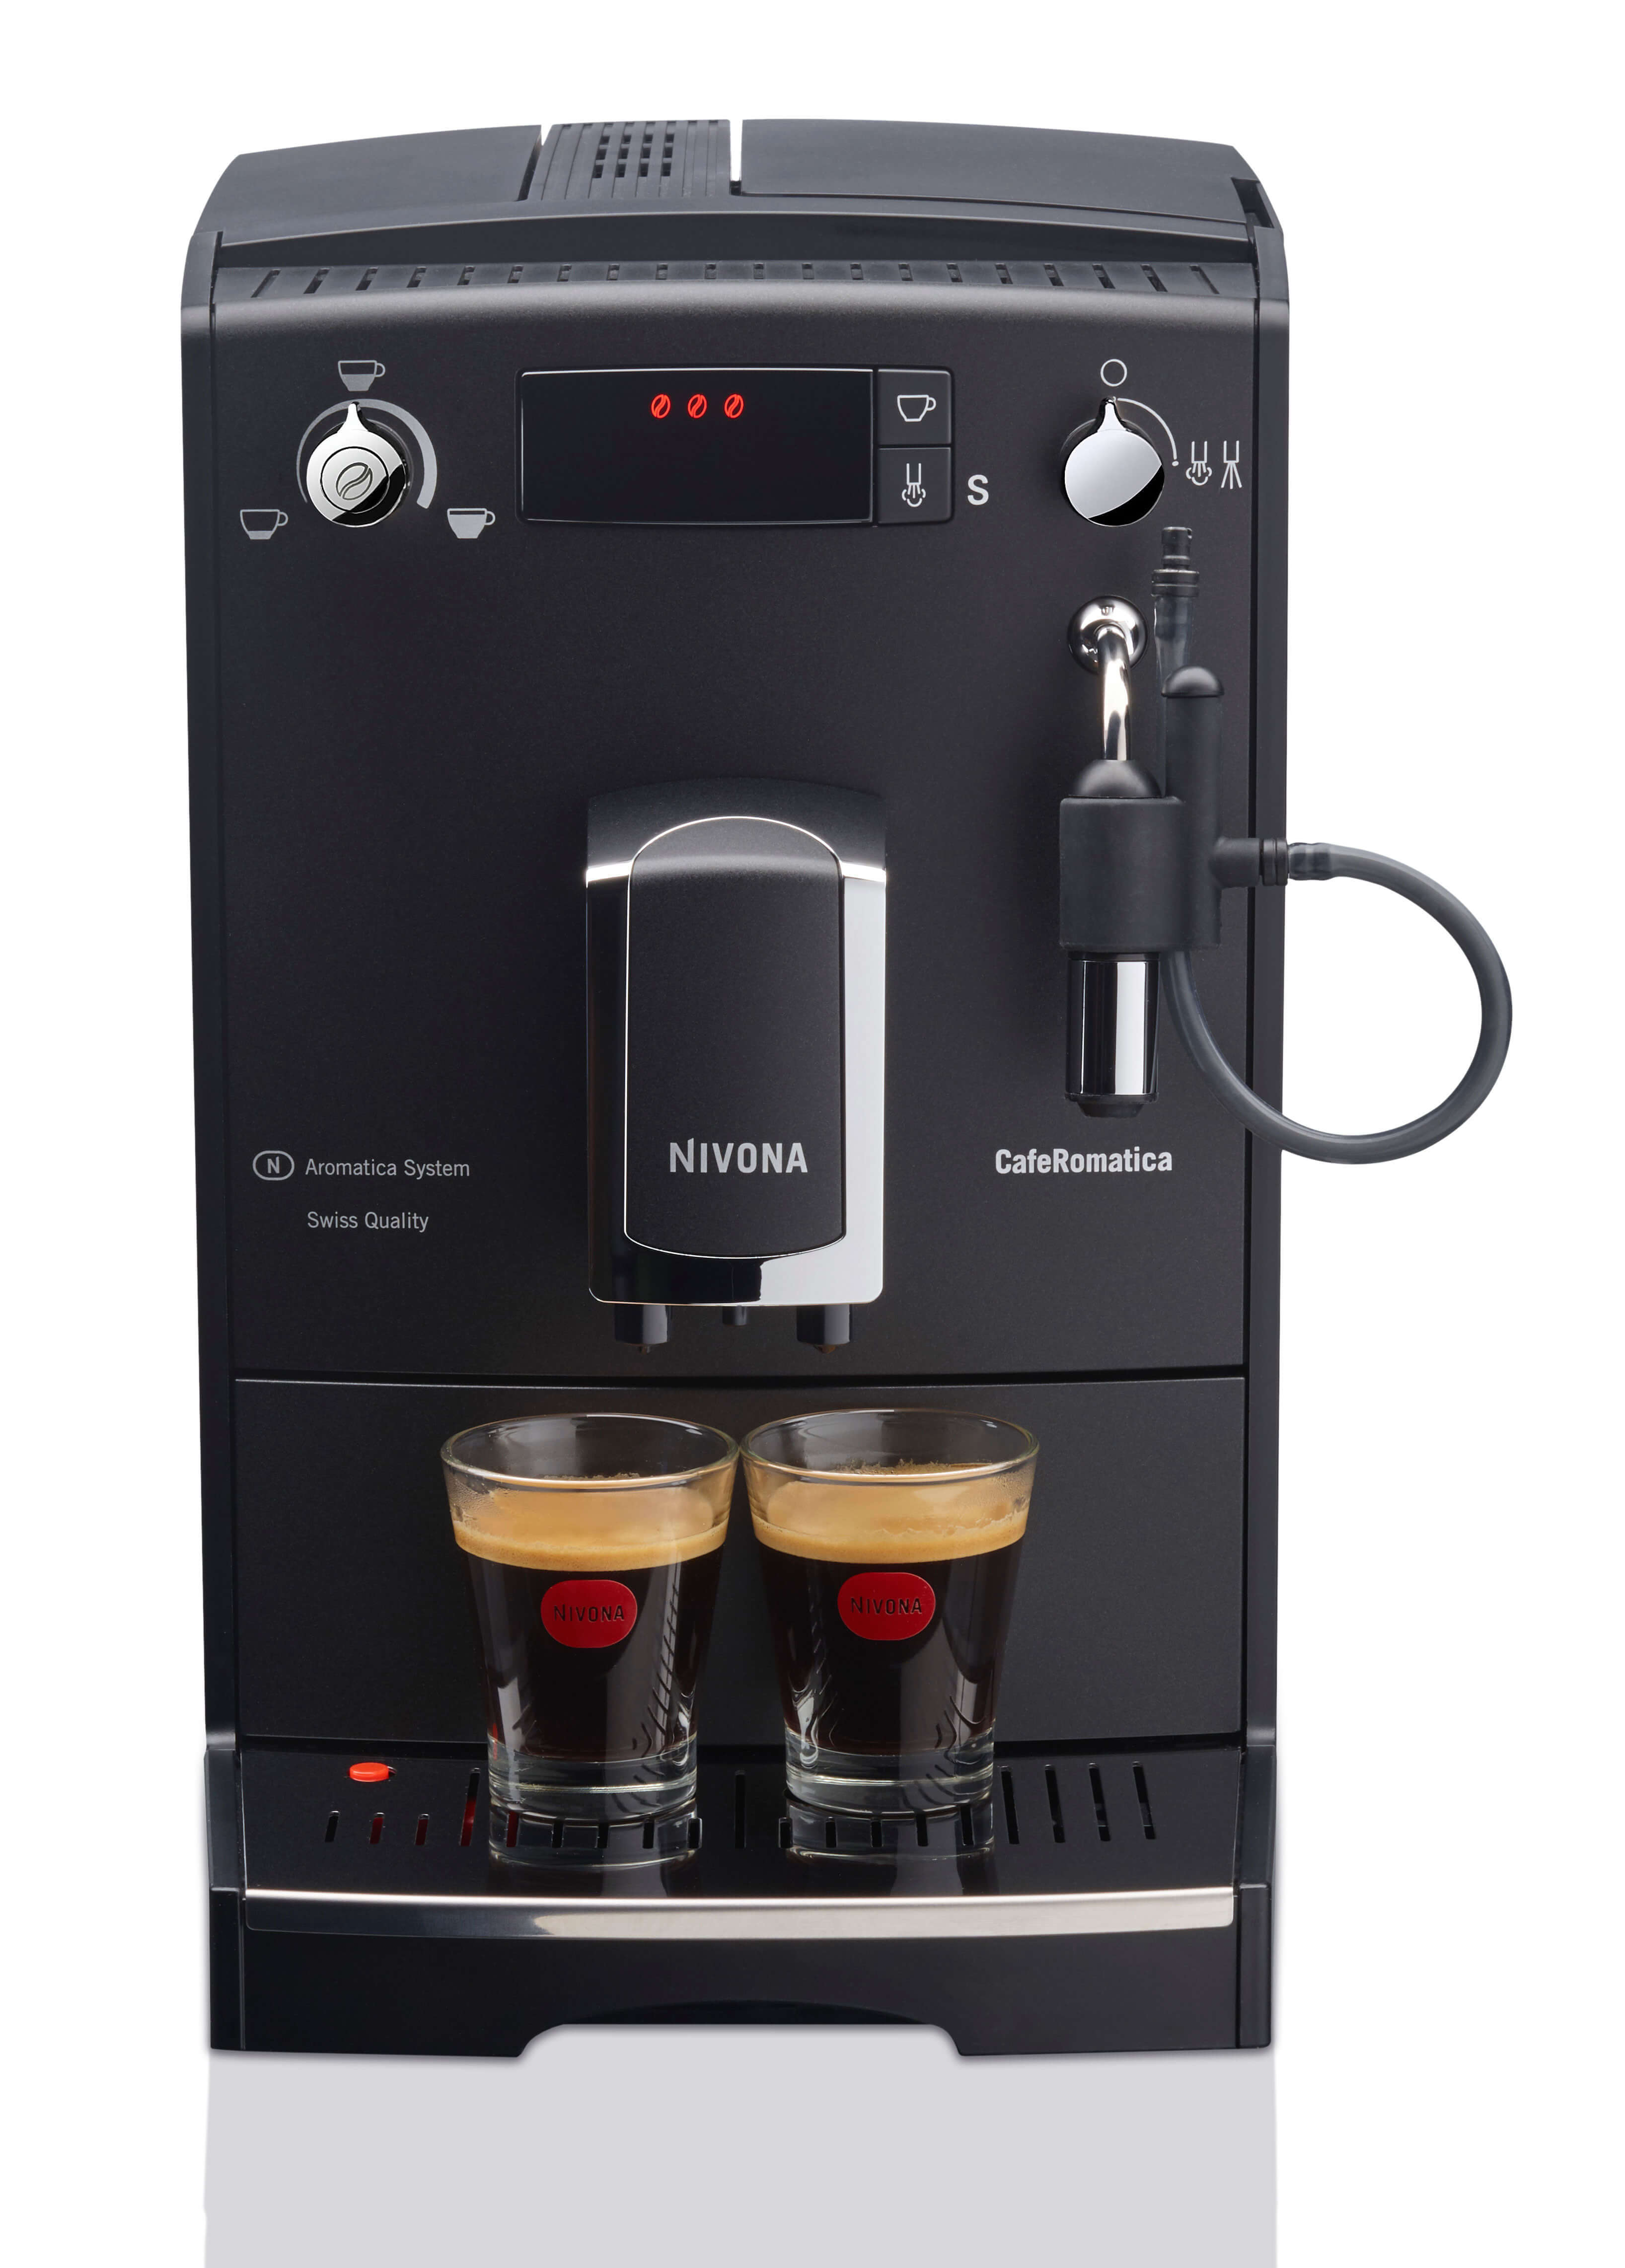 Nivona Kaffeevollautomat Cafe Romantica NICR 520 | Kamasega